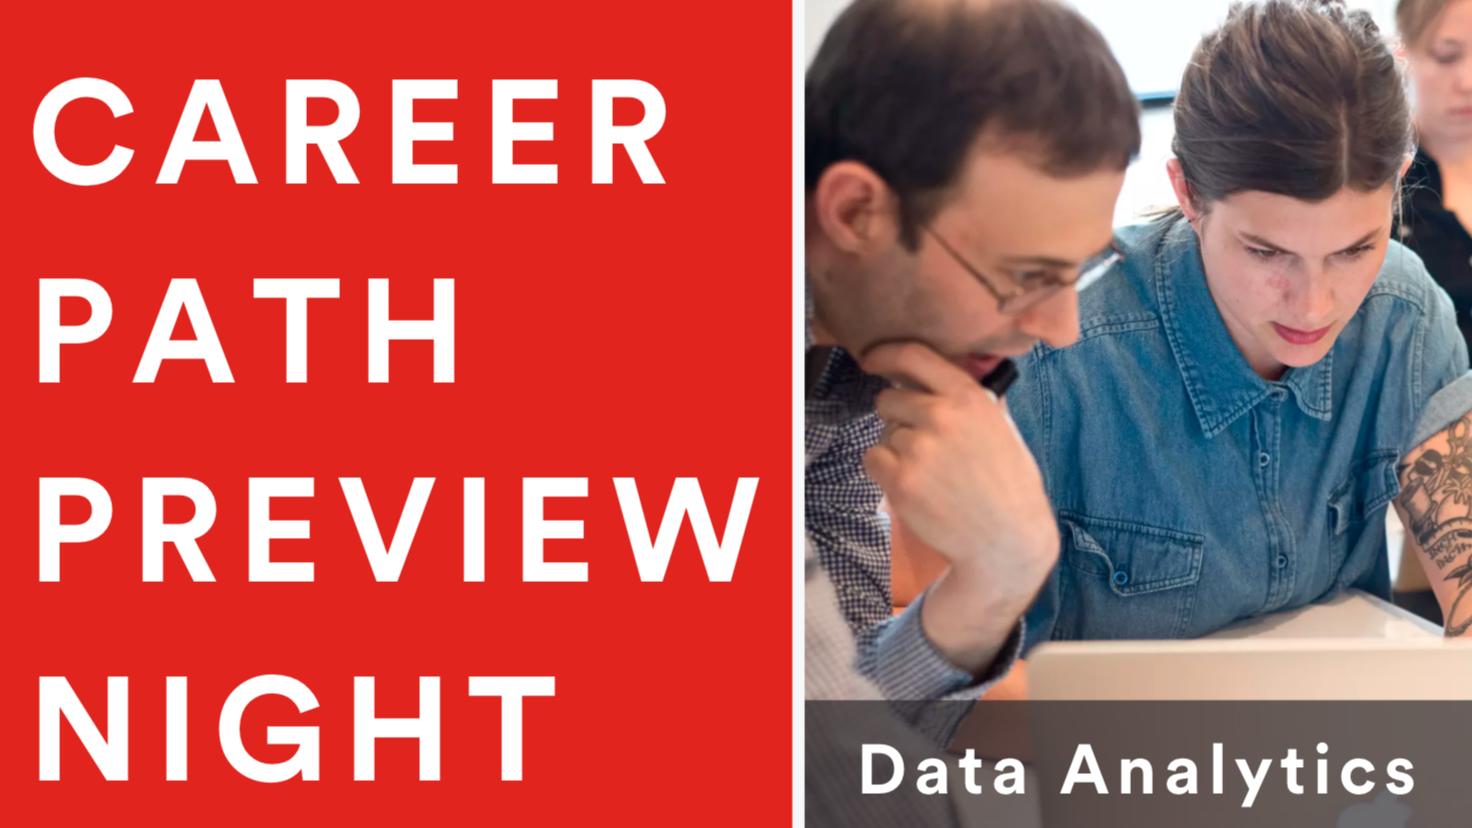 Career Path Preview Night: Data Analytics